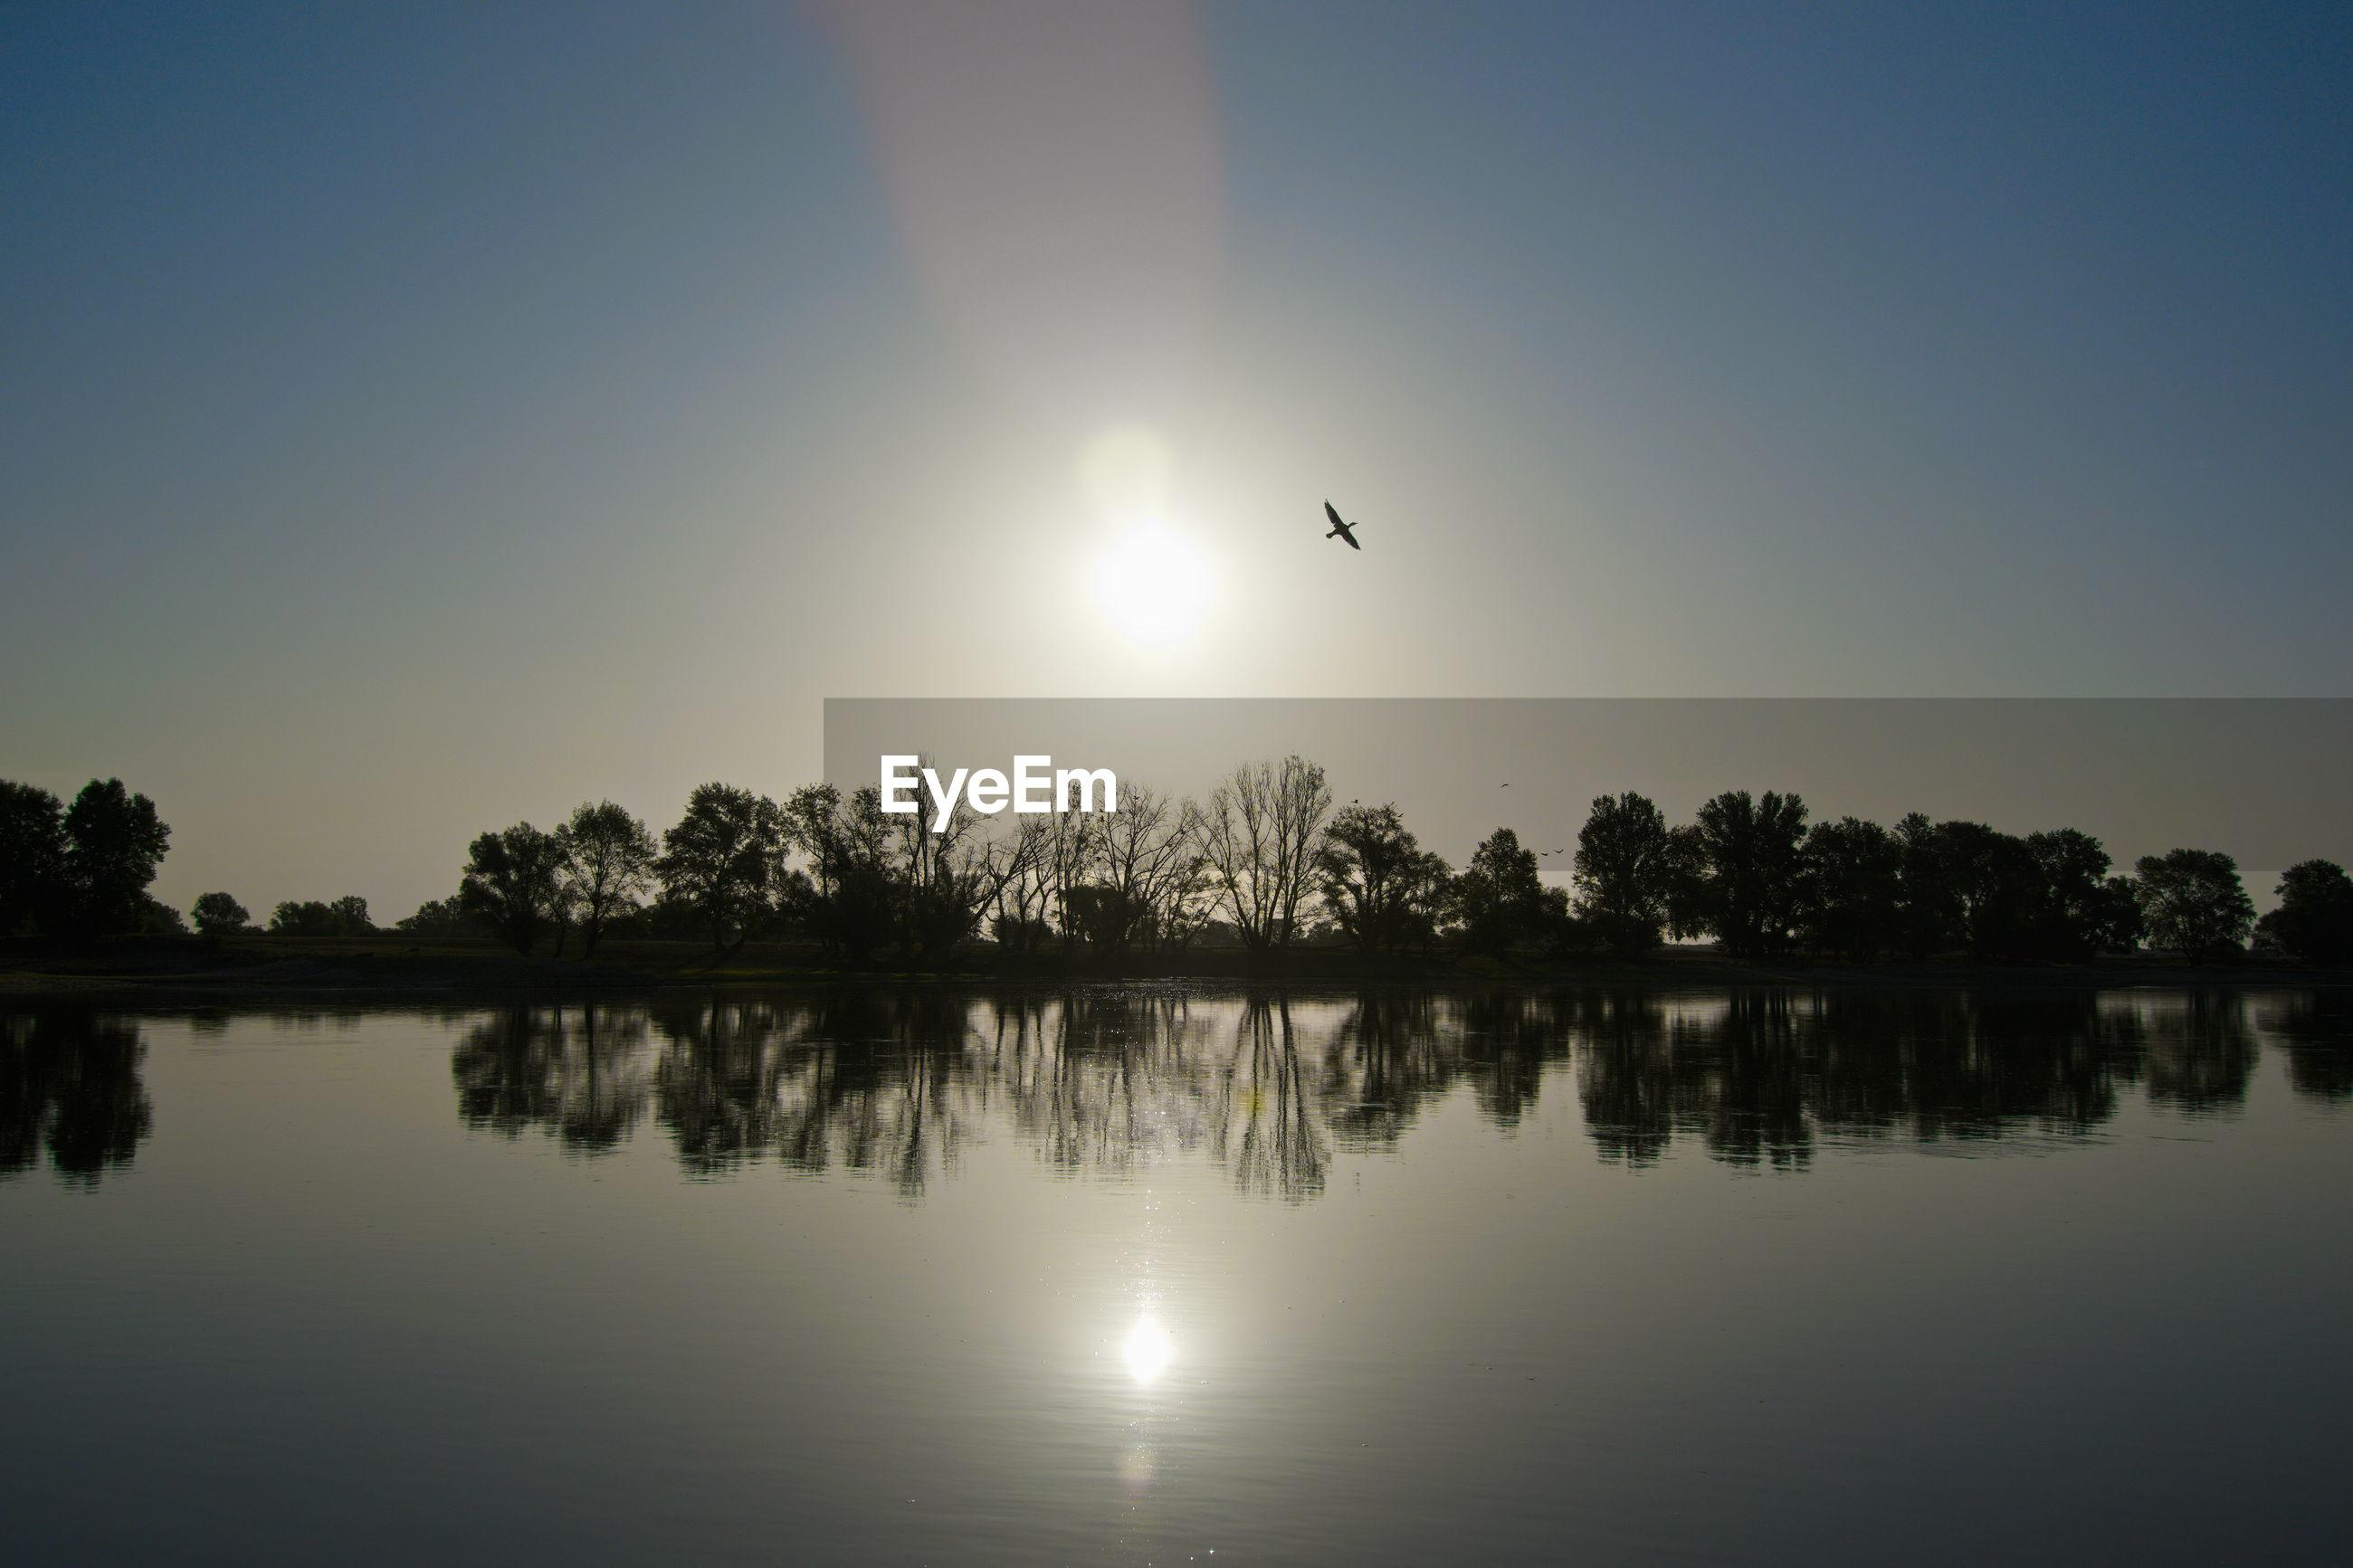 SILHOUETTE OF BIRD FLYING OVER LAKE